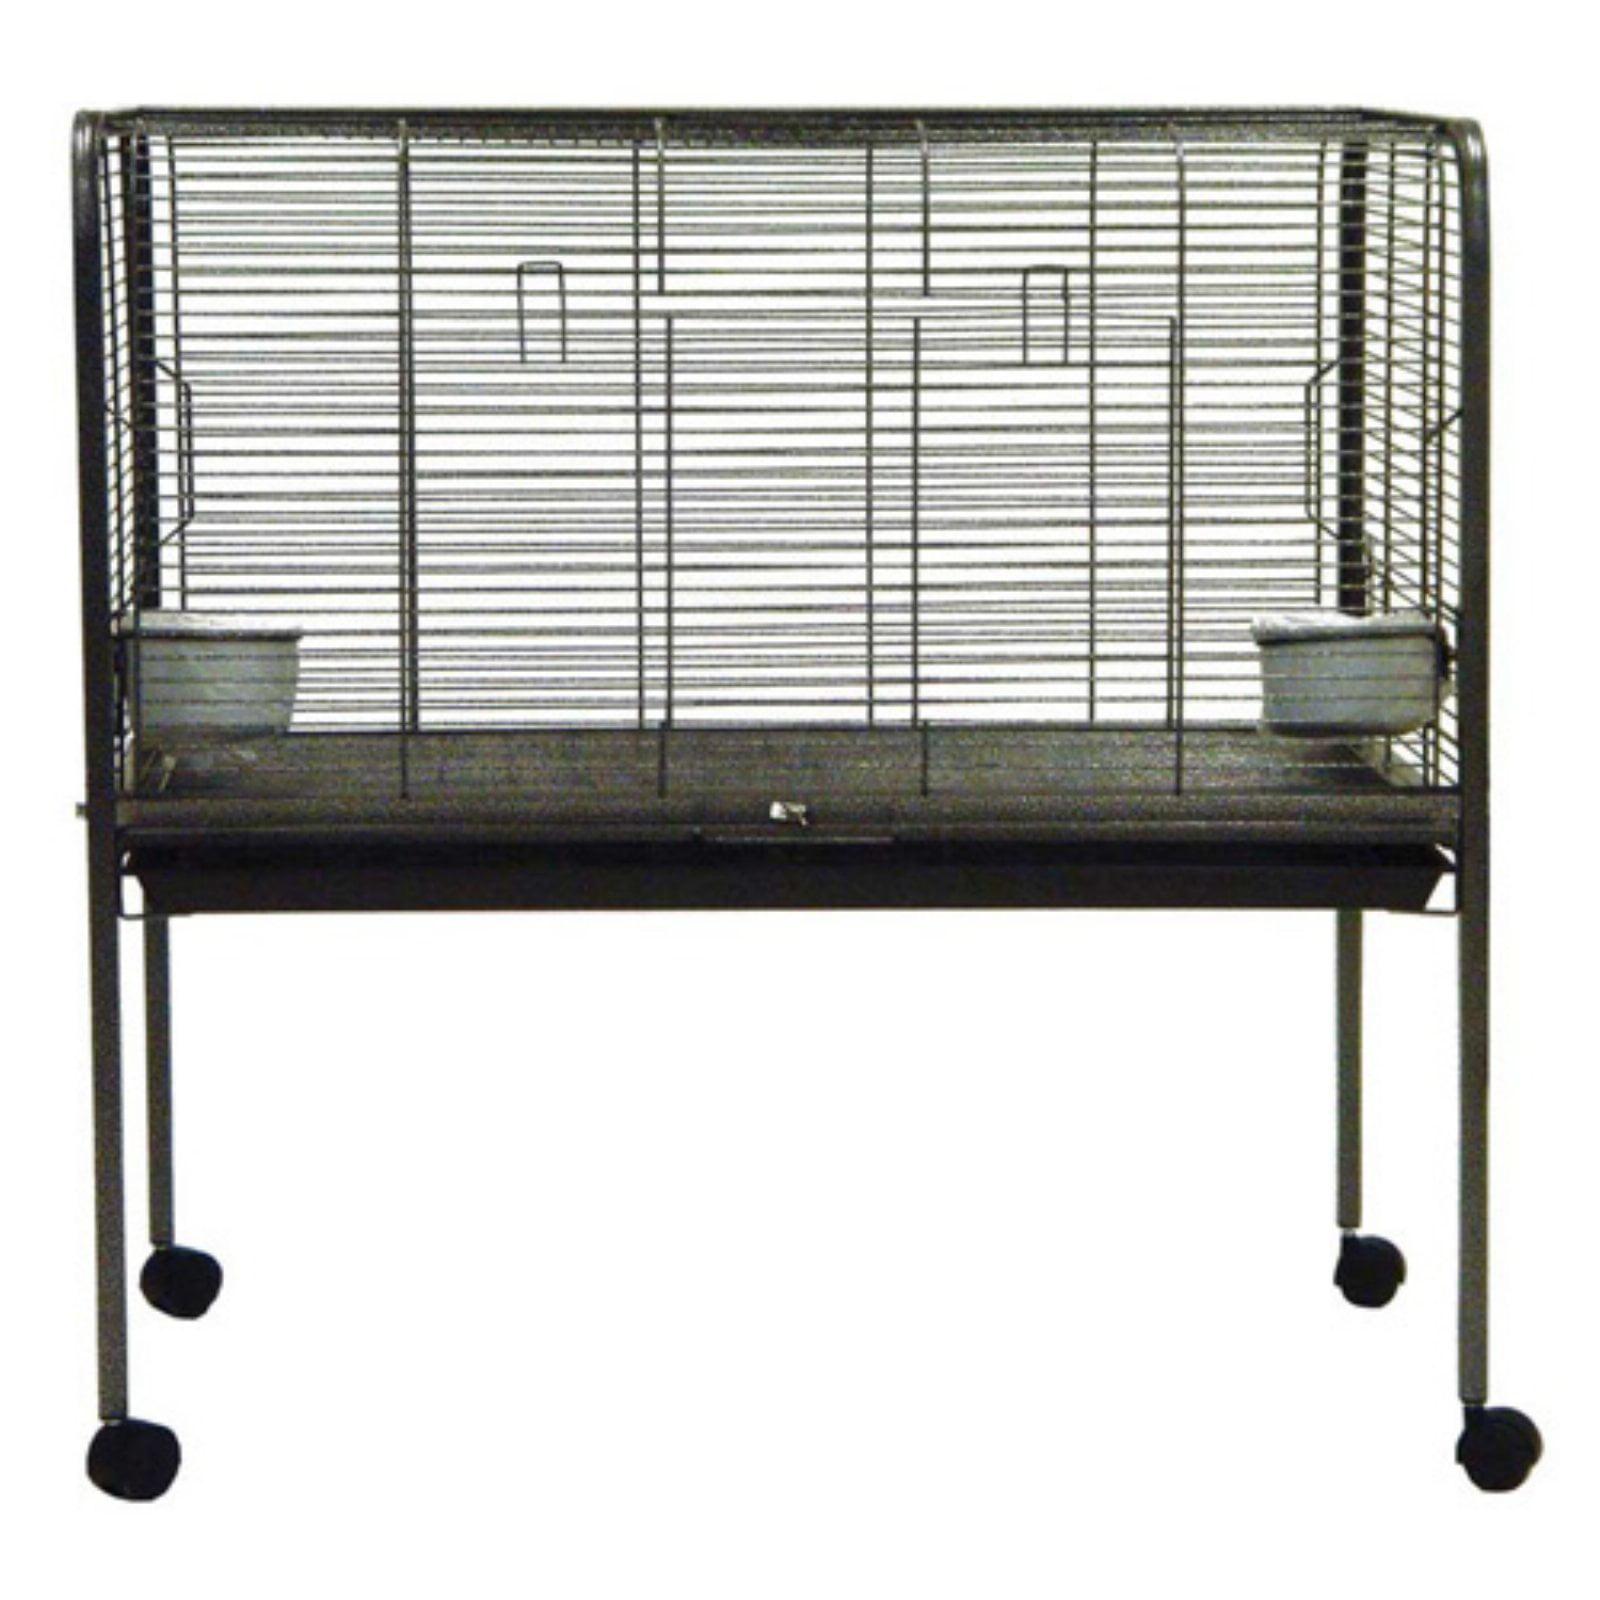 YML Rolling Rabbit Cage - Walmart.com